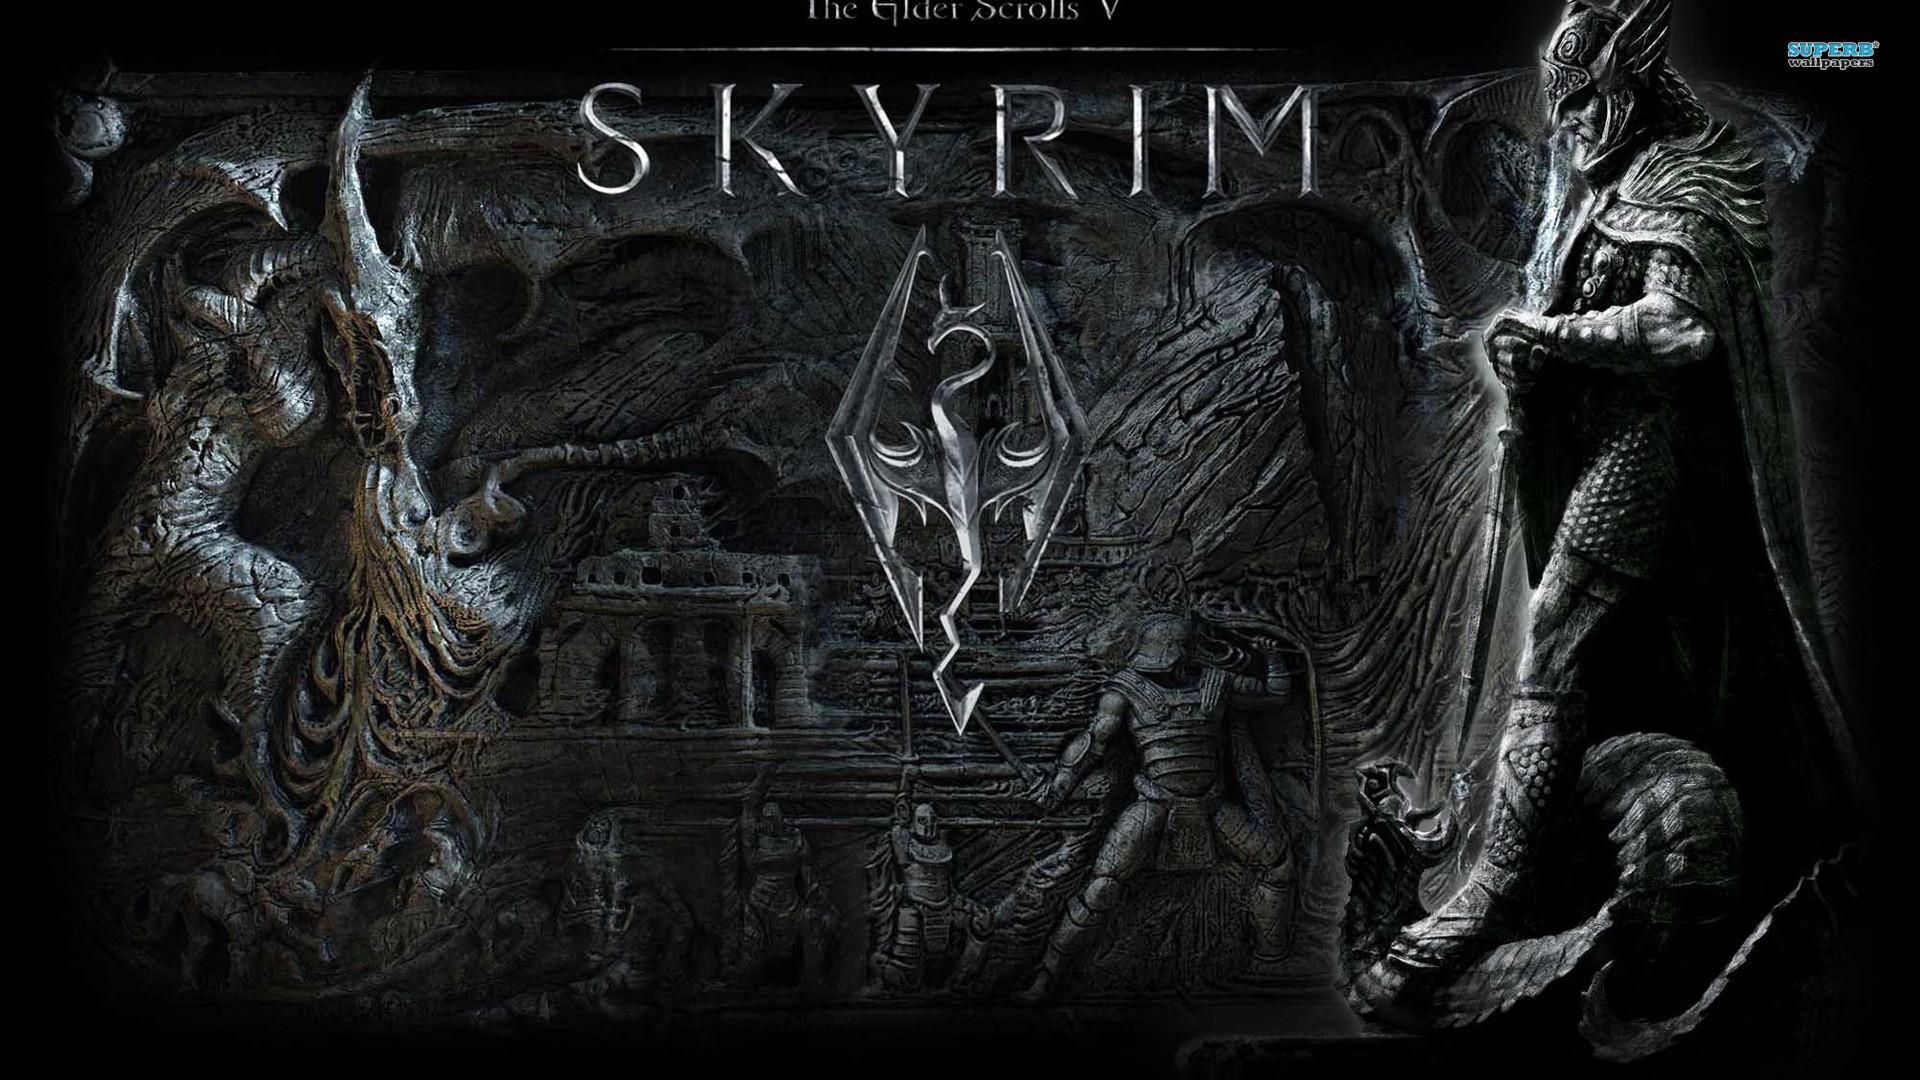 skyrim wallpaper – Google Search